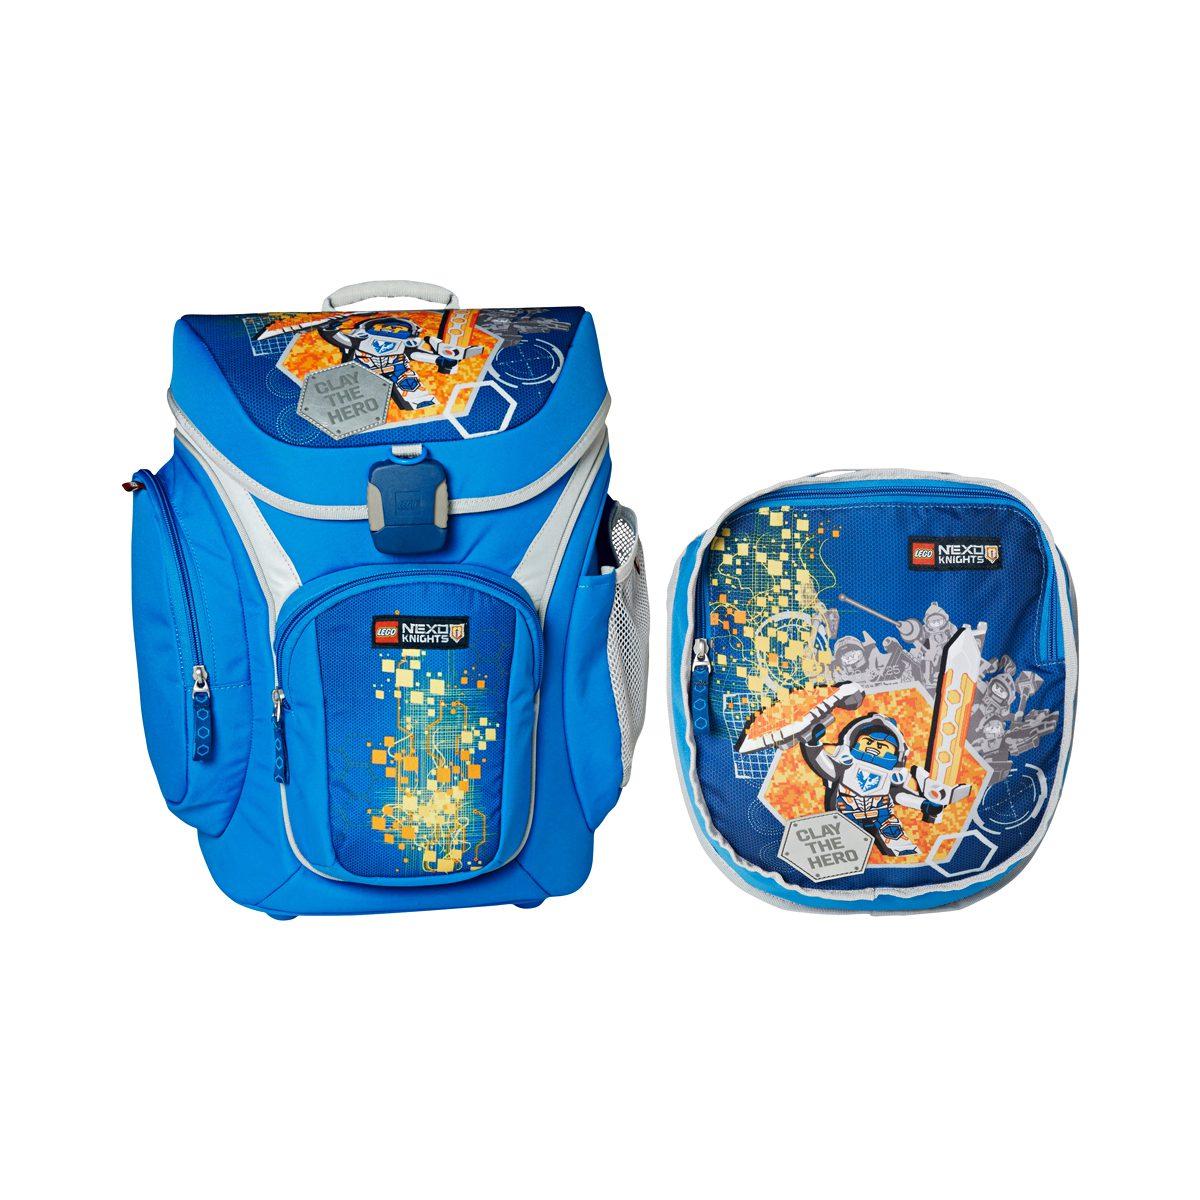 Ghiozdan Pentru Şcoală & Sac Sport, Explorer, Nexo Knights, Core Line, Bleu, Lego, LG-20018-1708